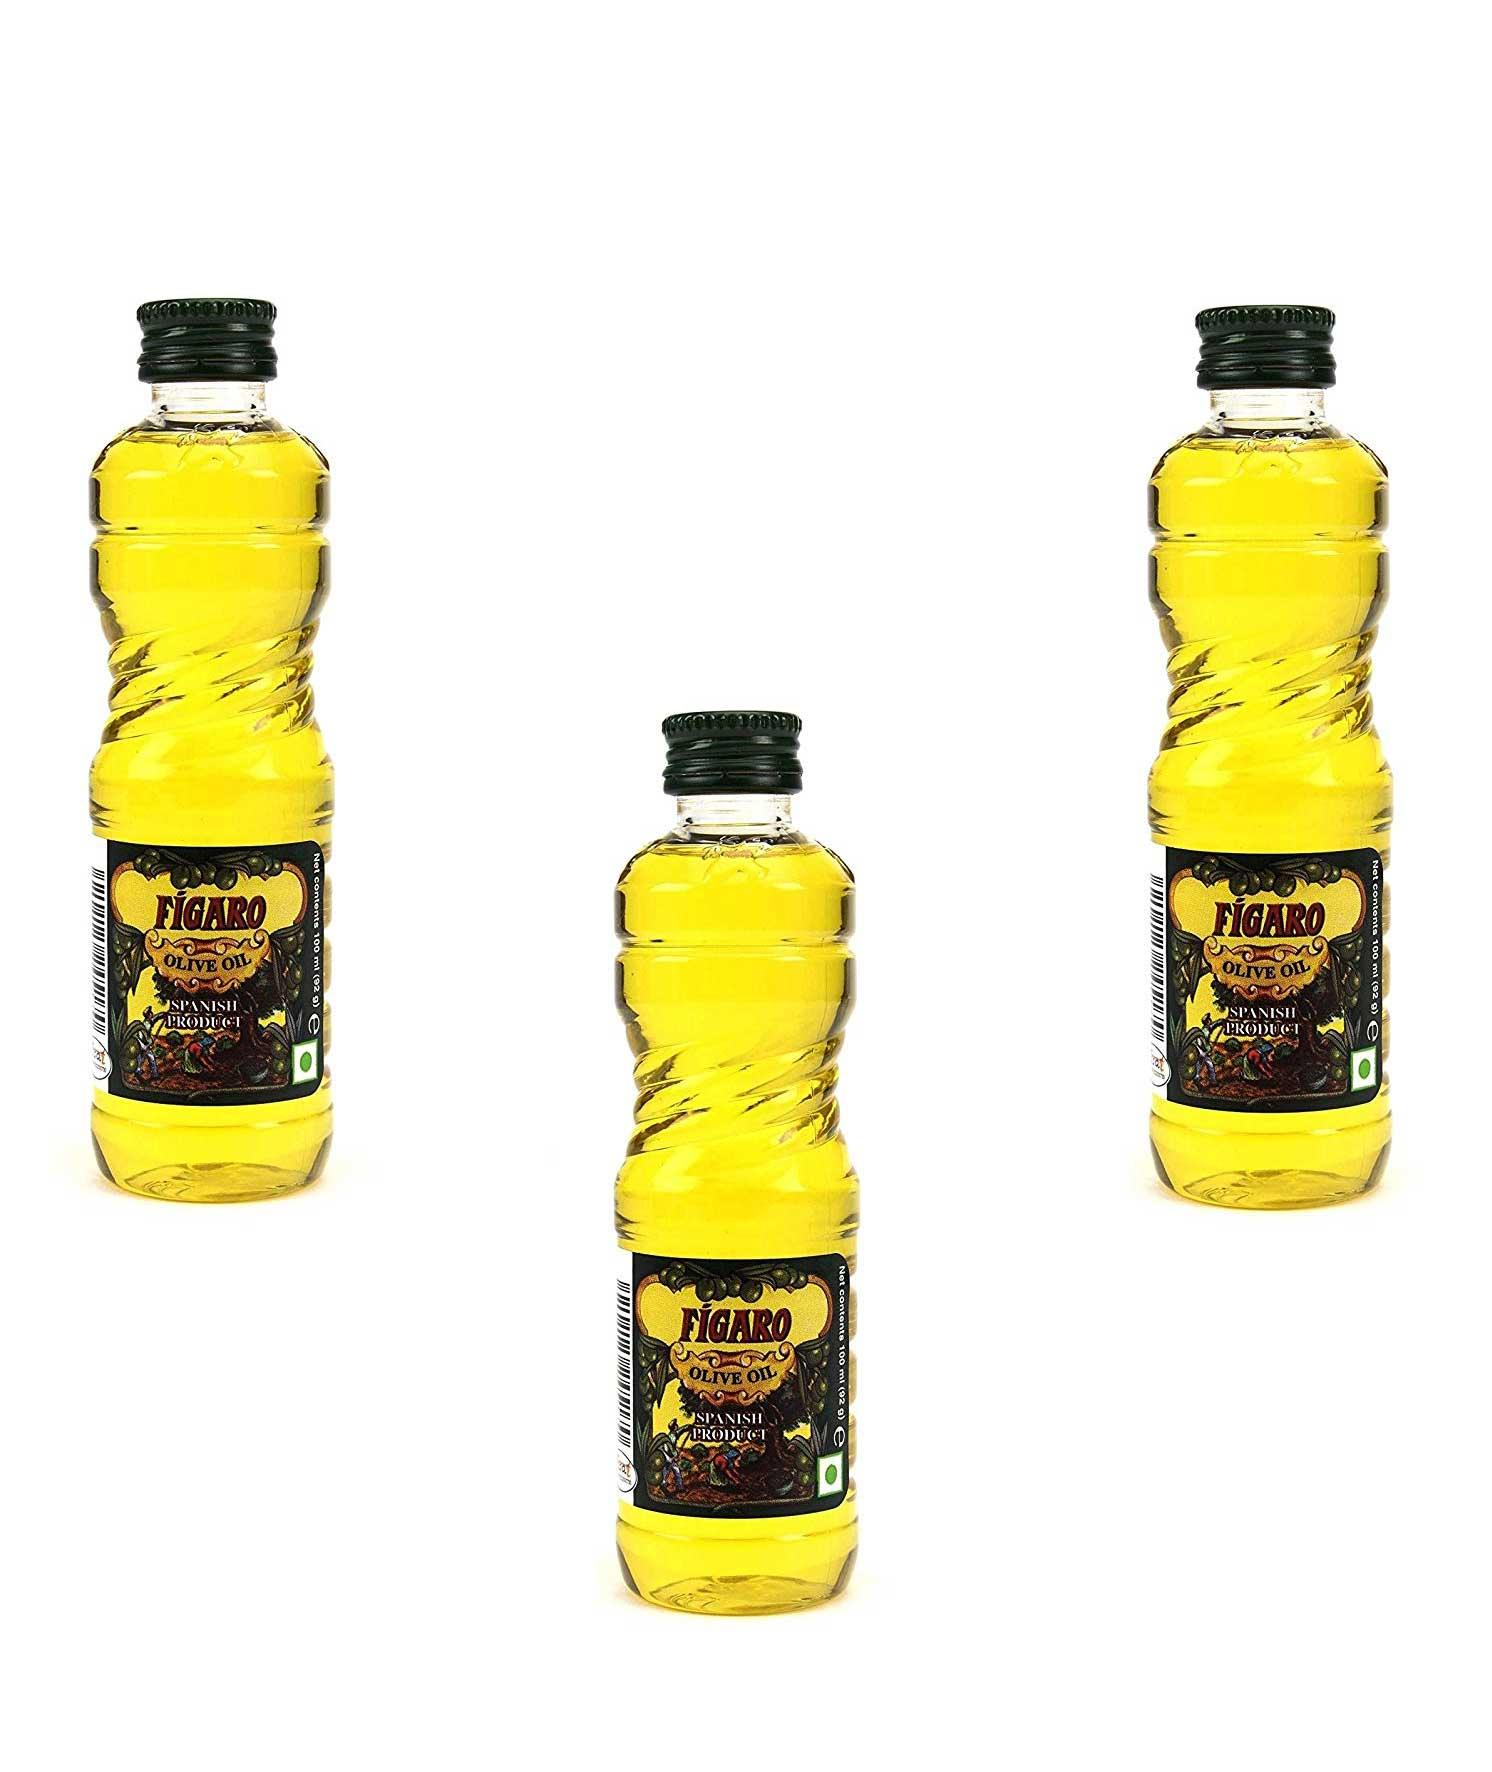 Figaro Olive Oil 100mL (Set of 3)